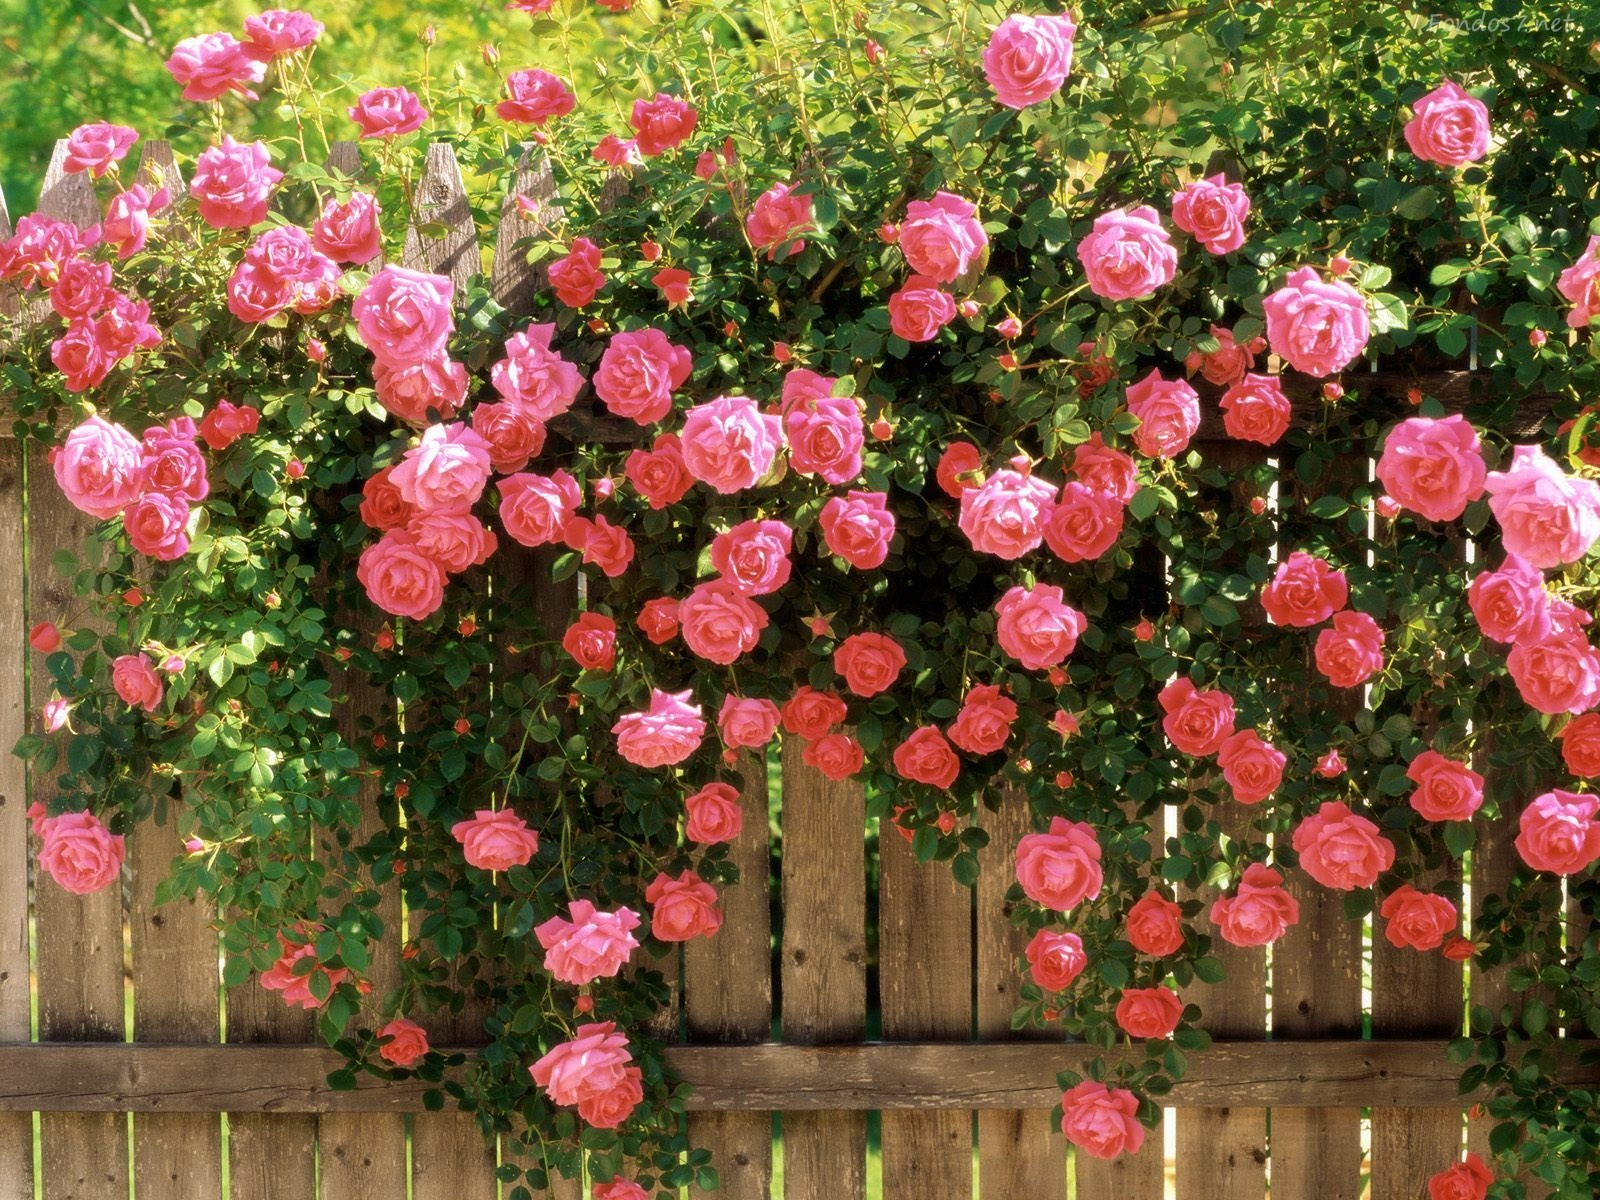 jardines-de-flores-10